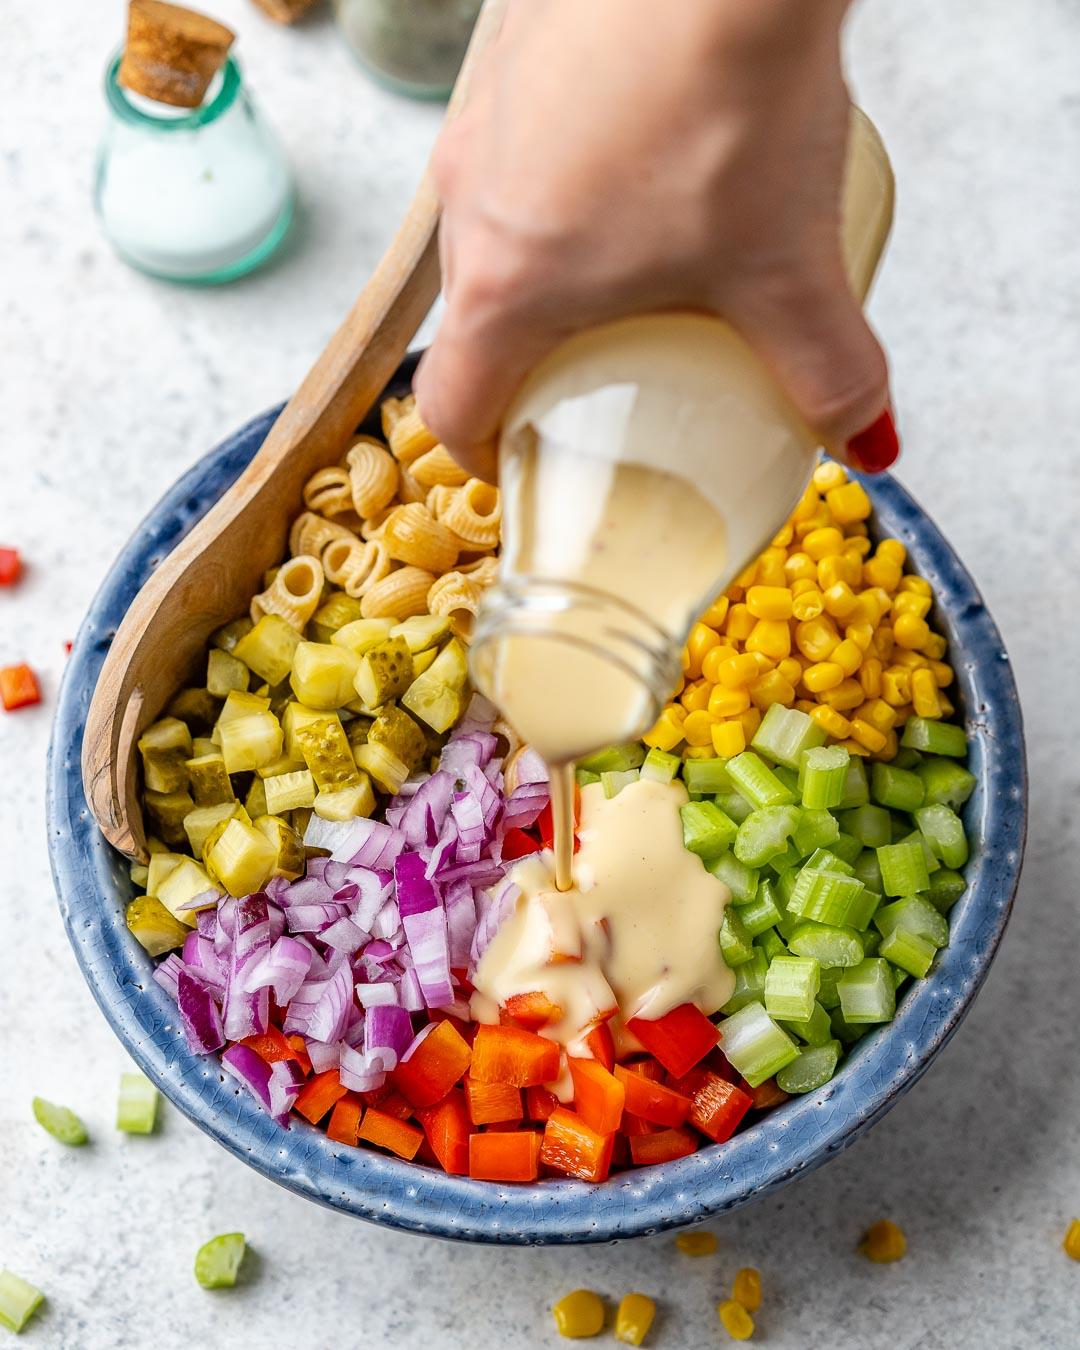 Easy Macaroni Salad Recipe – How To Make Vegan Macaroni Salad - 16